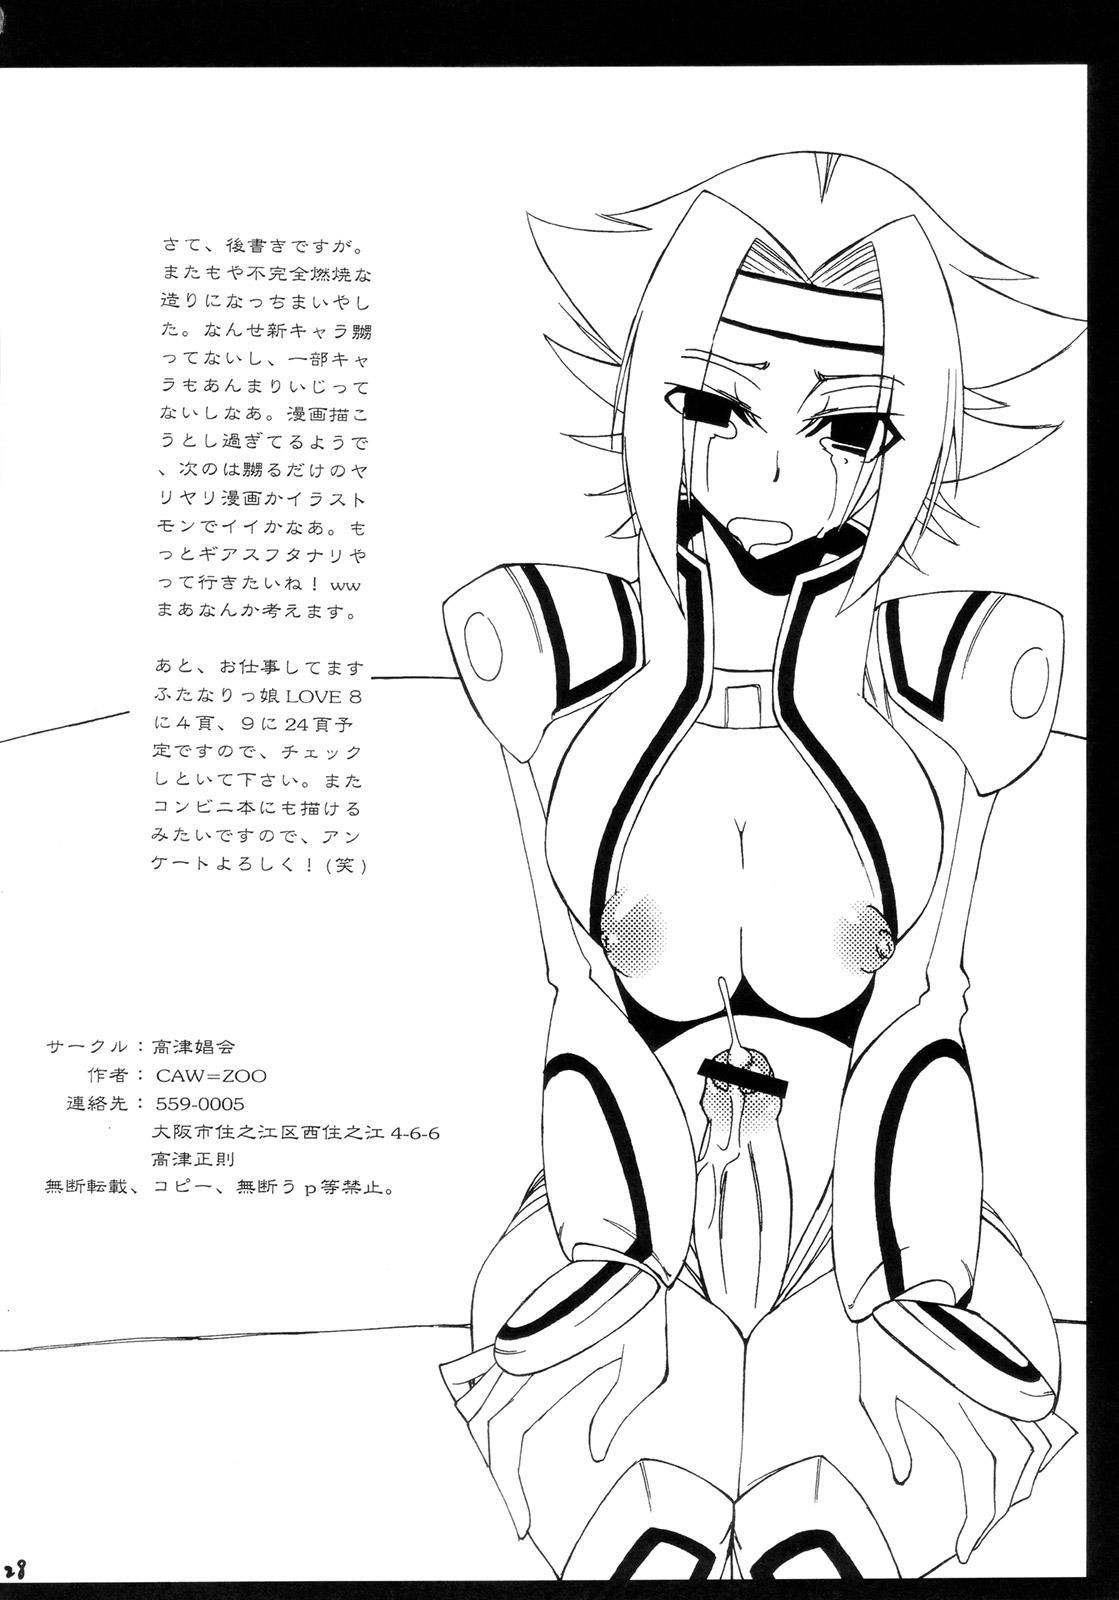 Rakshata-san no Ganbou 28